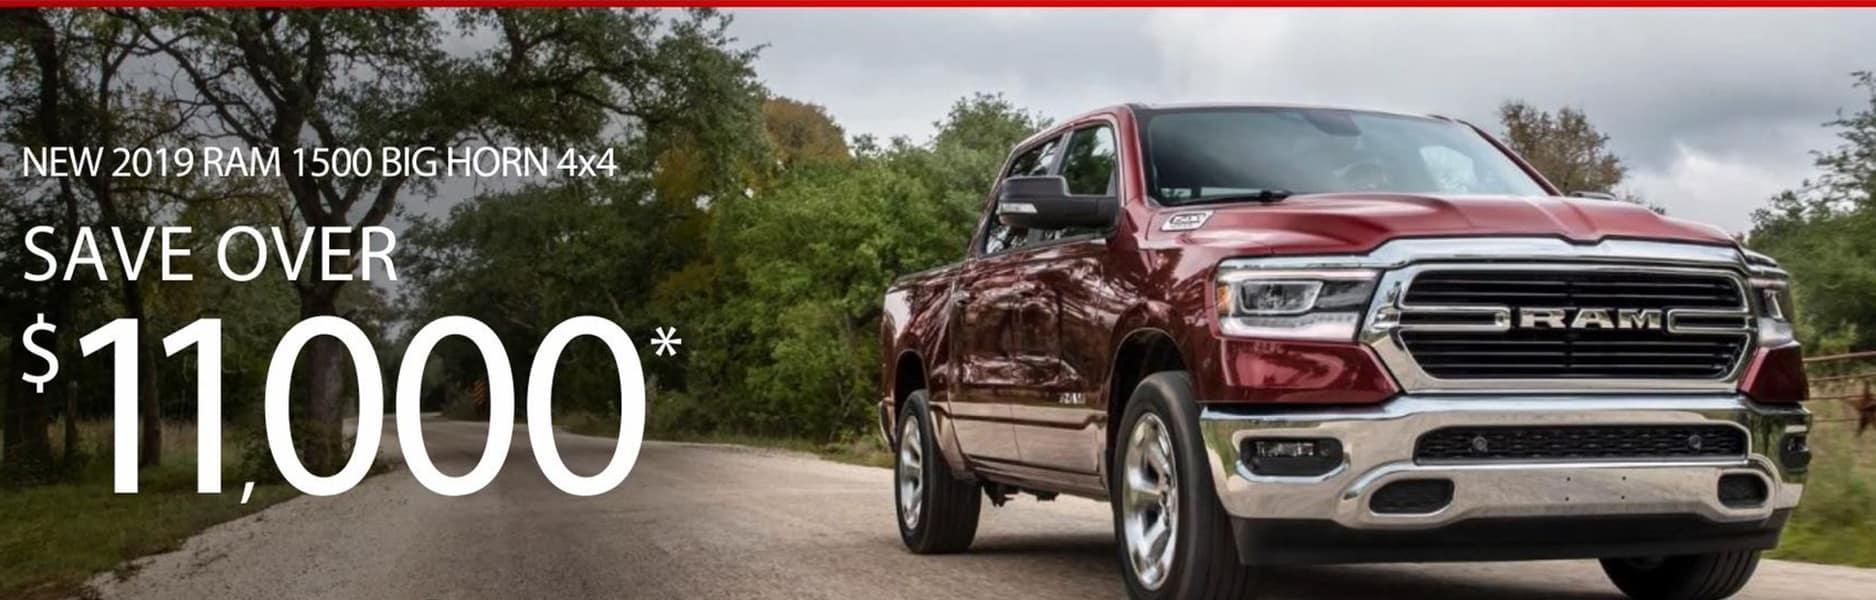 $11,000 off RAM Trucks at David Taylor Ellisville Chrysler Dodge Jeep RAM